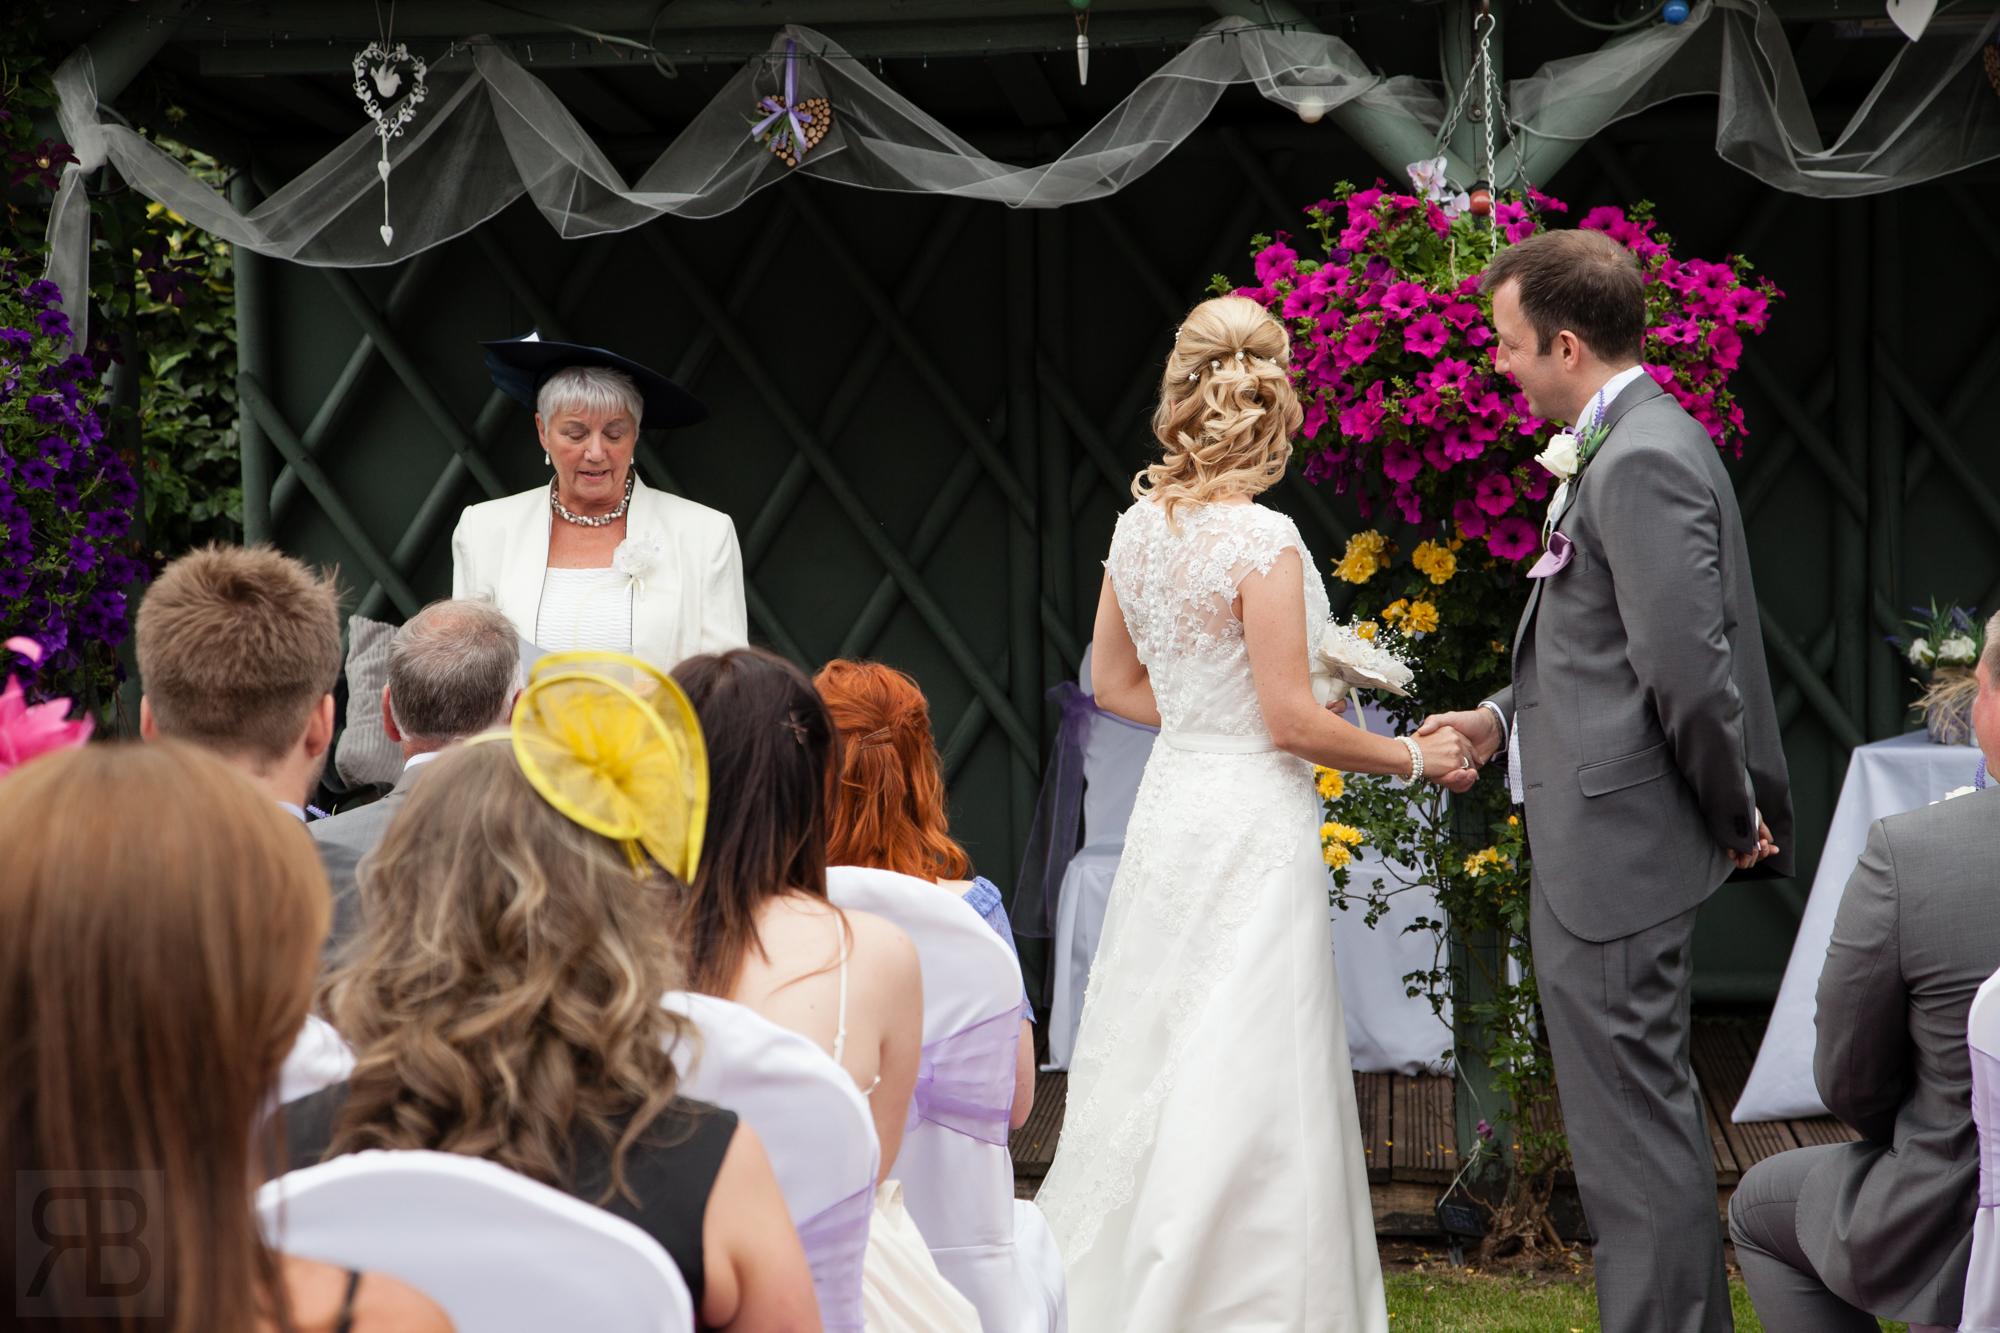 110715_LisaCraigJohnson_Wedding_5606198_WebWM.jpg